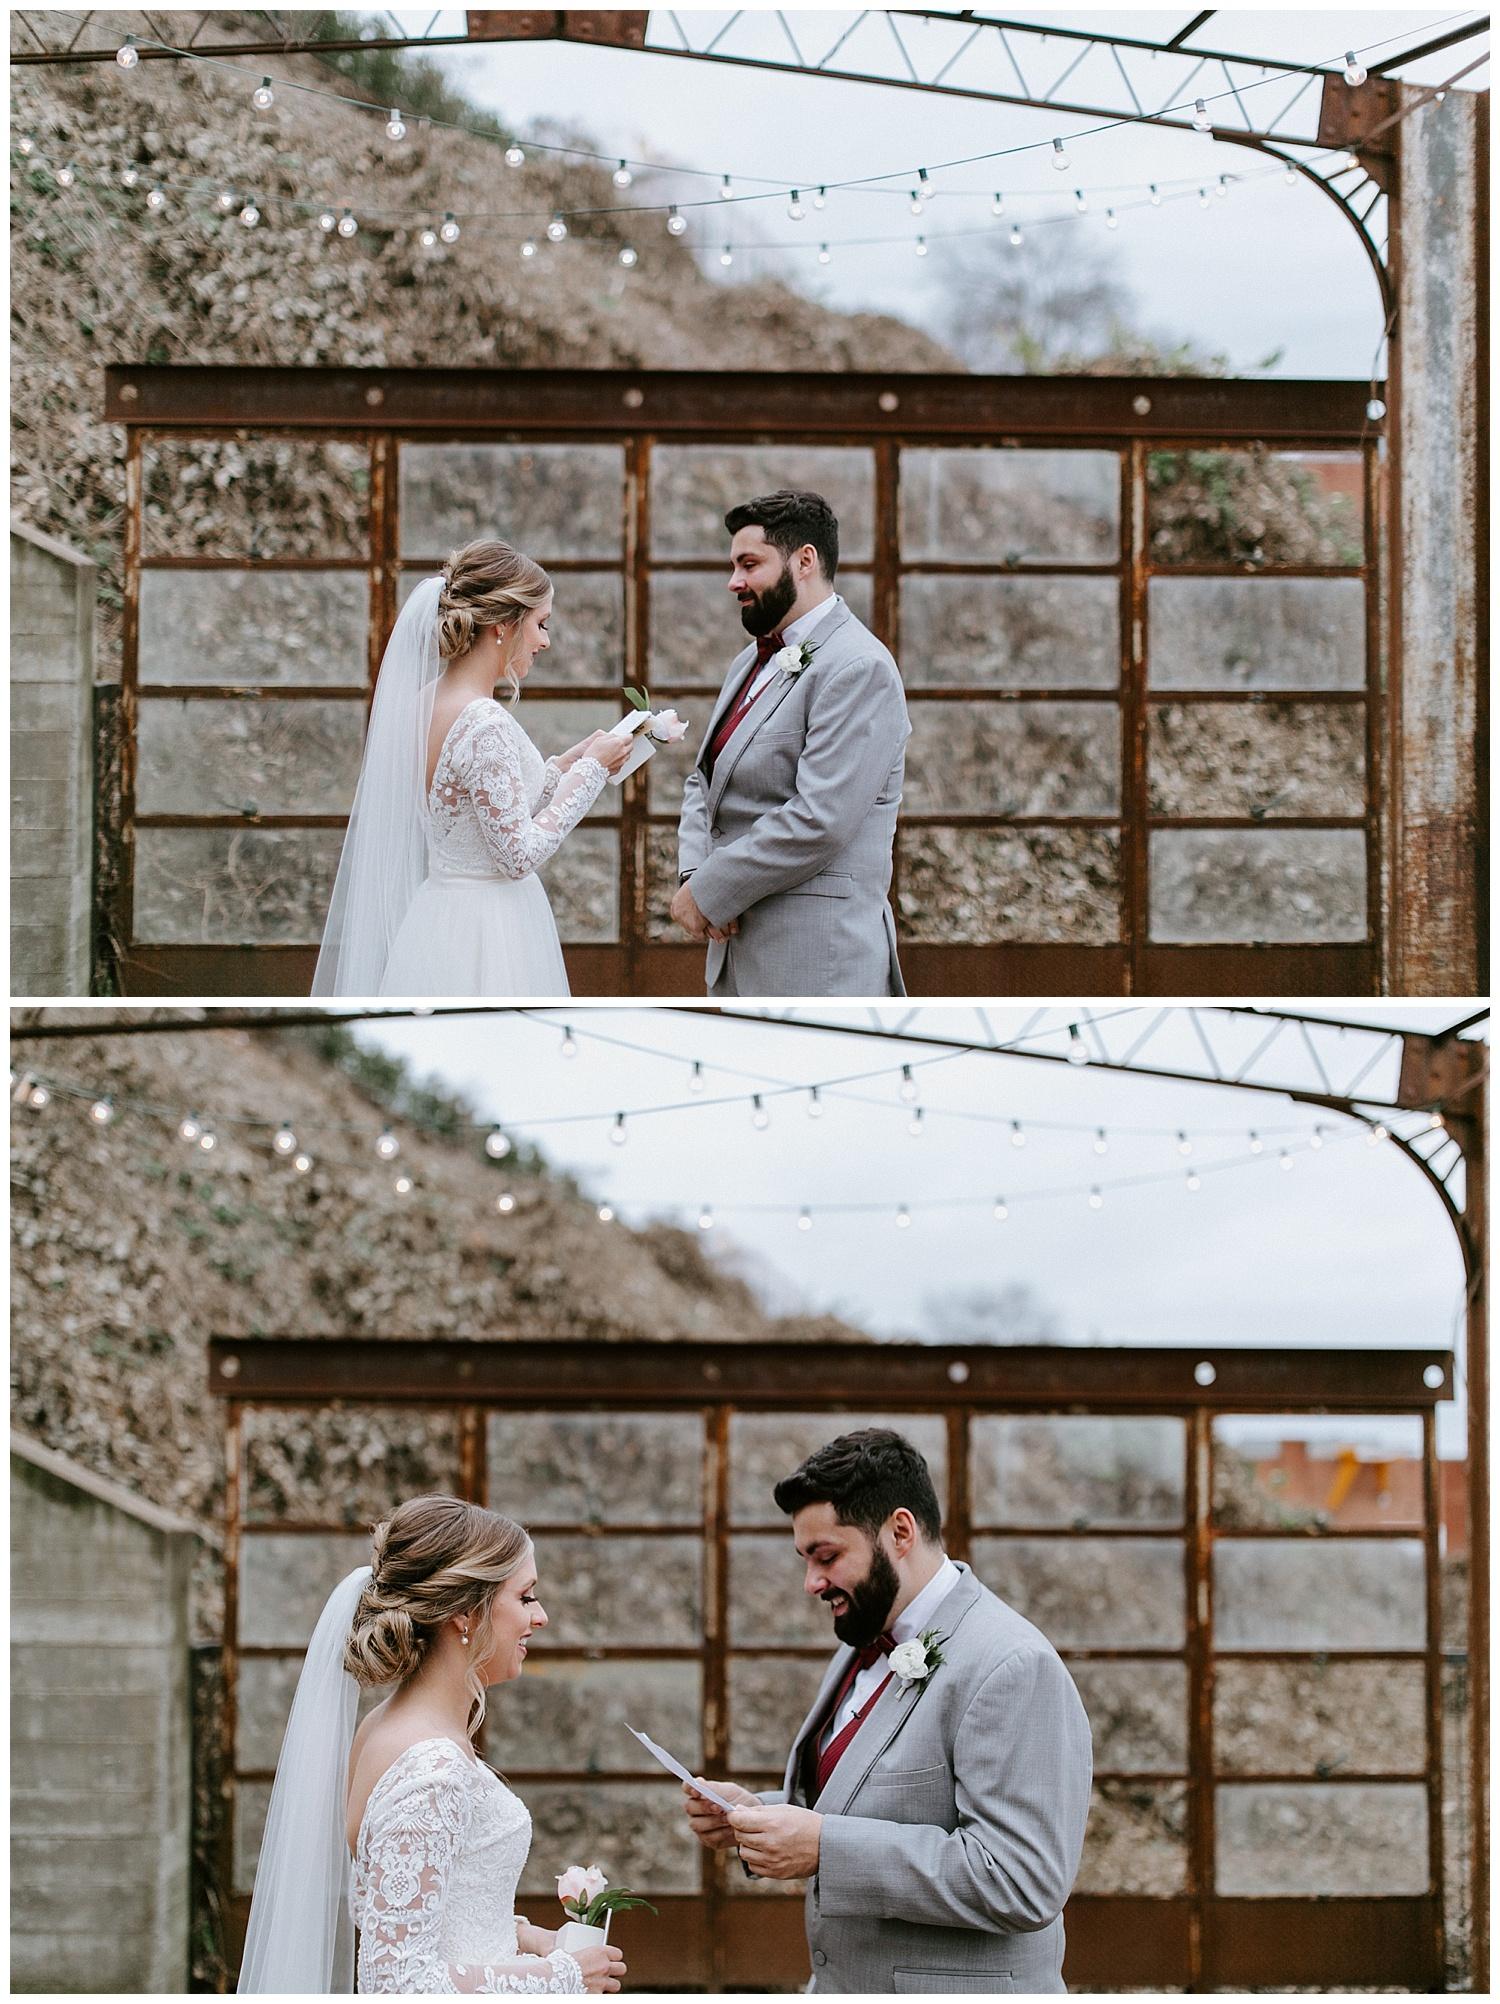 winter-wedding-the standard-knoxville_2019-01-23_0028.jpg